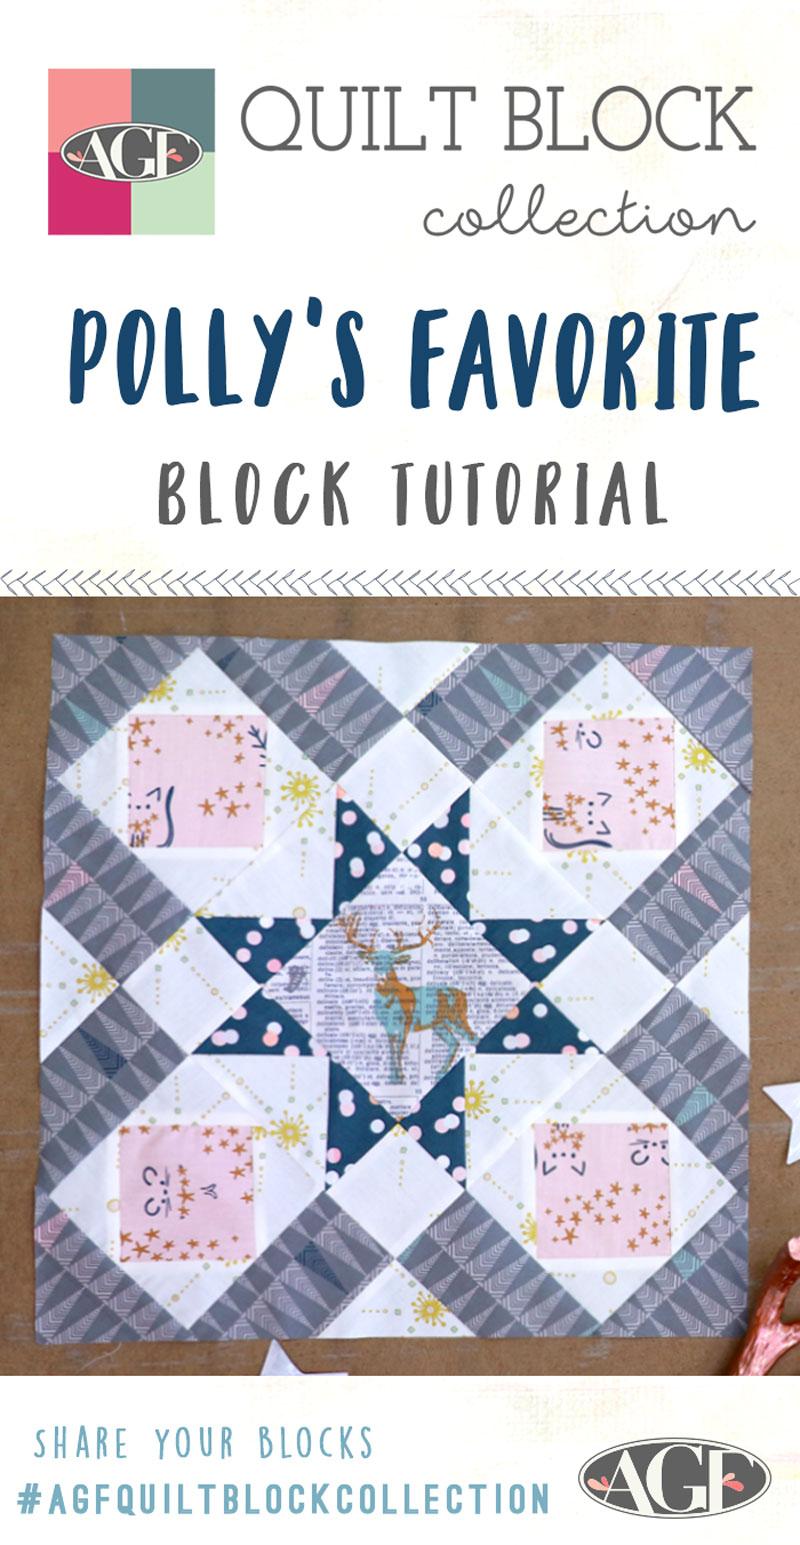 Polly's-Favorite-Block-Tutorial